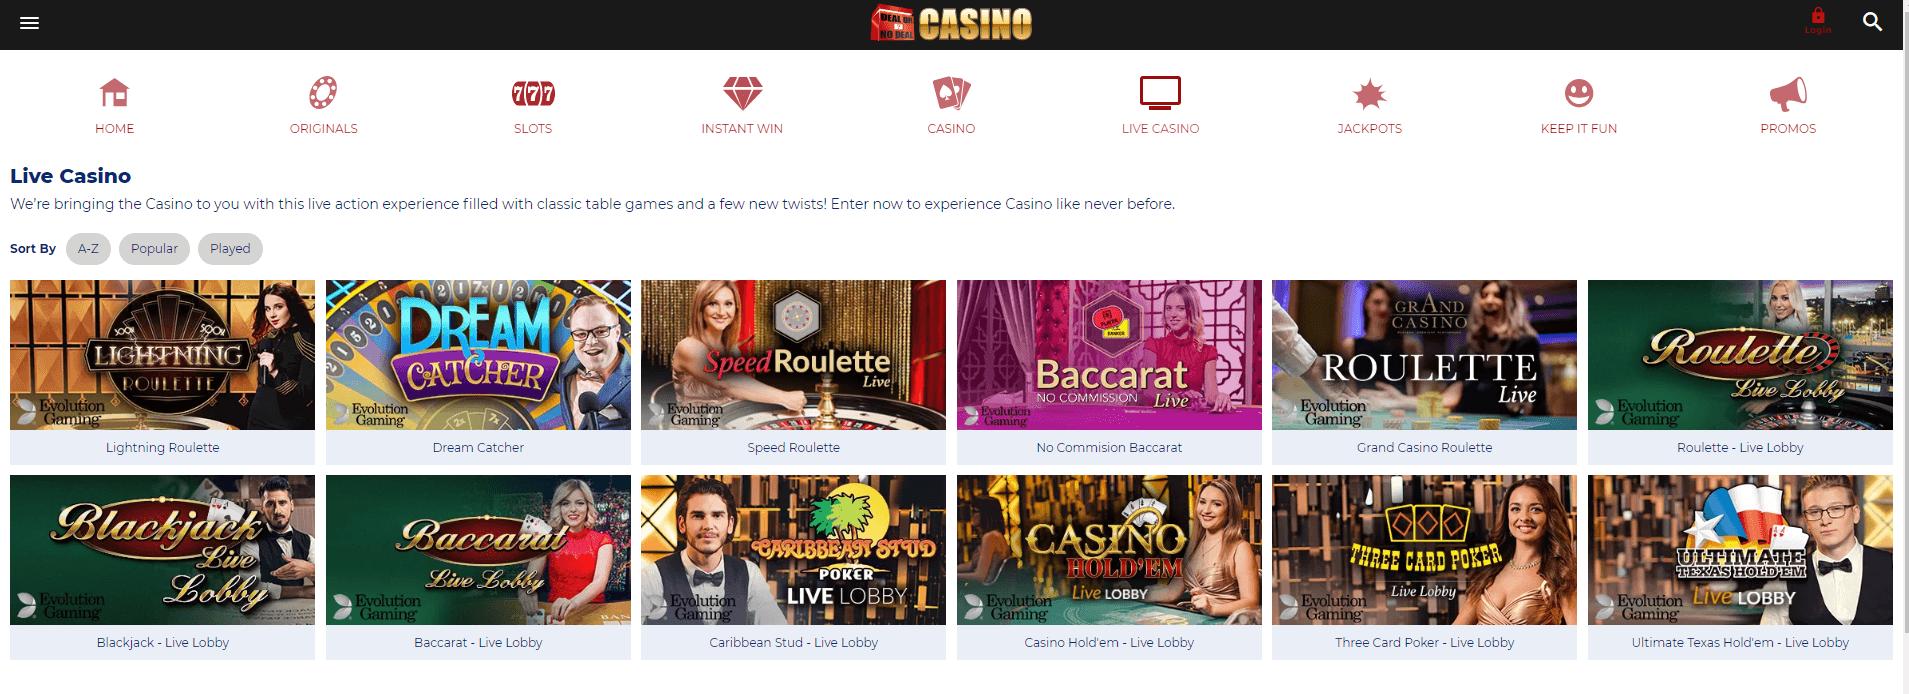 Dealornodeal Casino